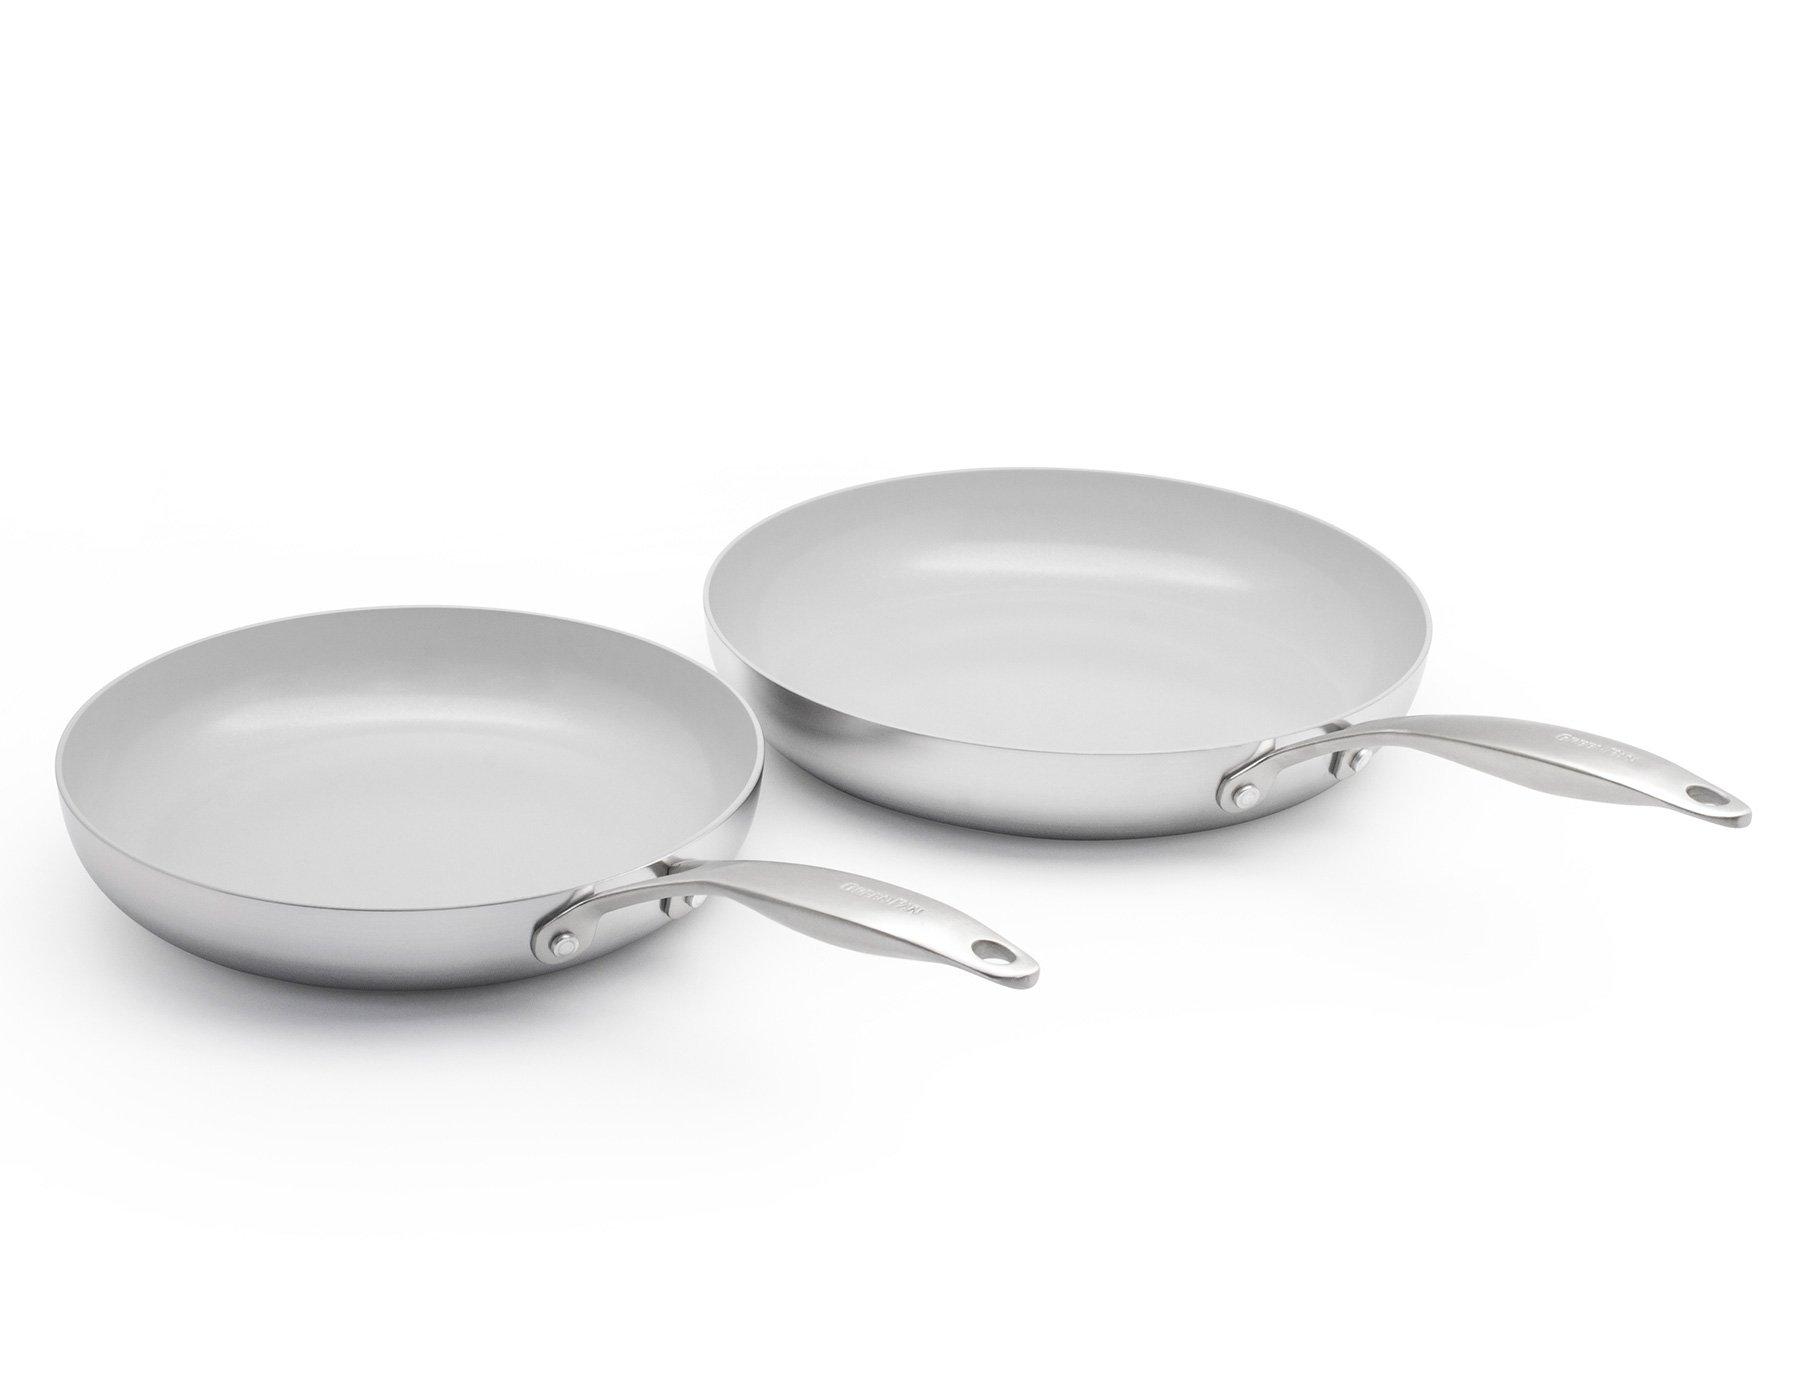 GreenPan Venice Pro 10'' and 12'' Ceramic Non-Stick Open Frypan Set